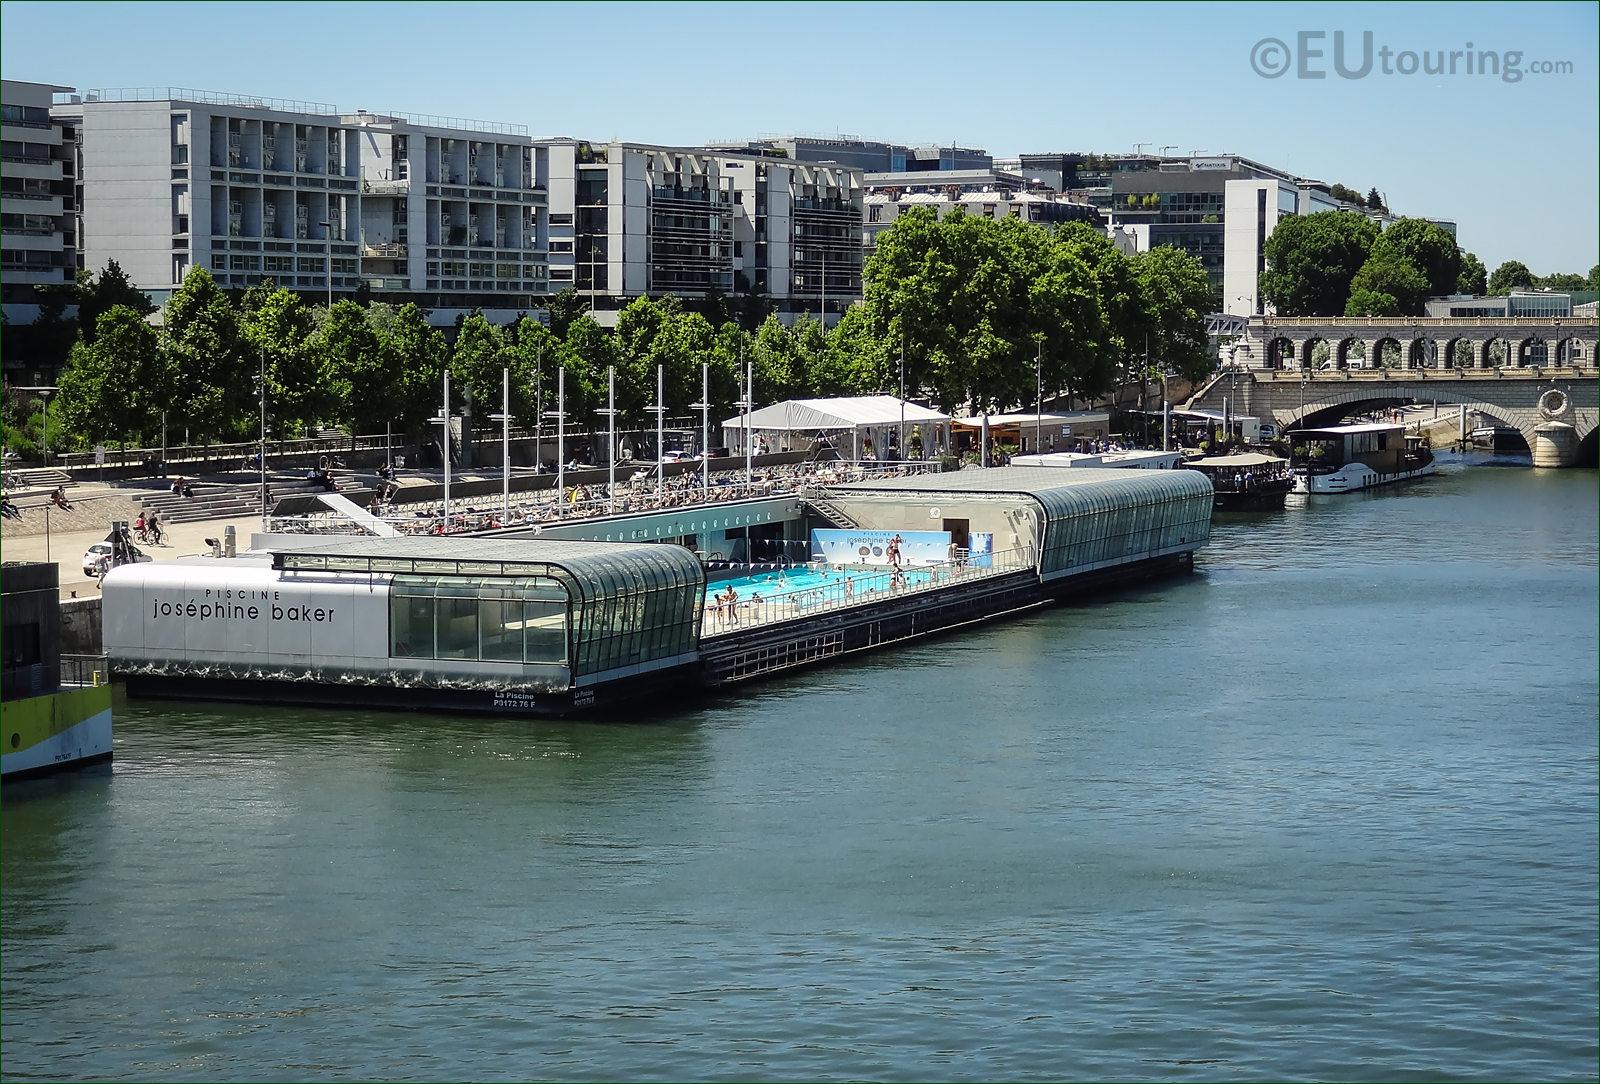 Photo Of Piscine Josephine Barker On The River Seine Paris ... intérieur Piscine Josephine Baker